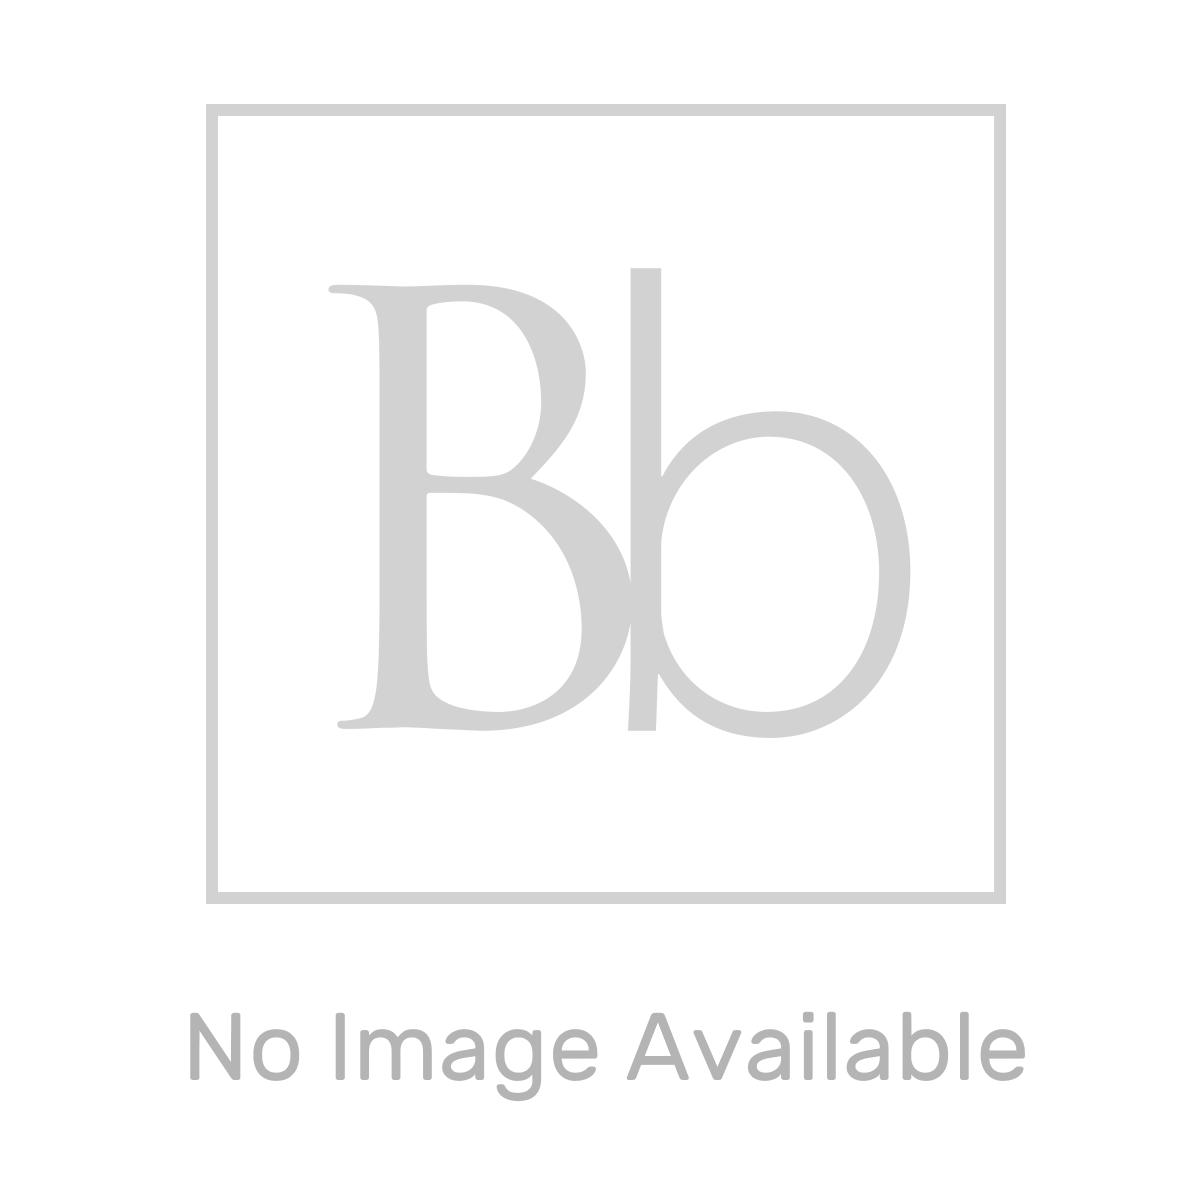 Aquadart Black Slate Shower Tray 1600 x 900 Dimension